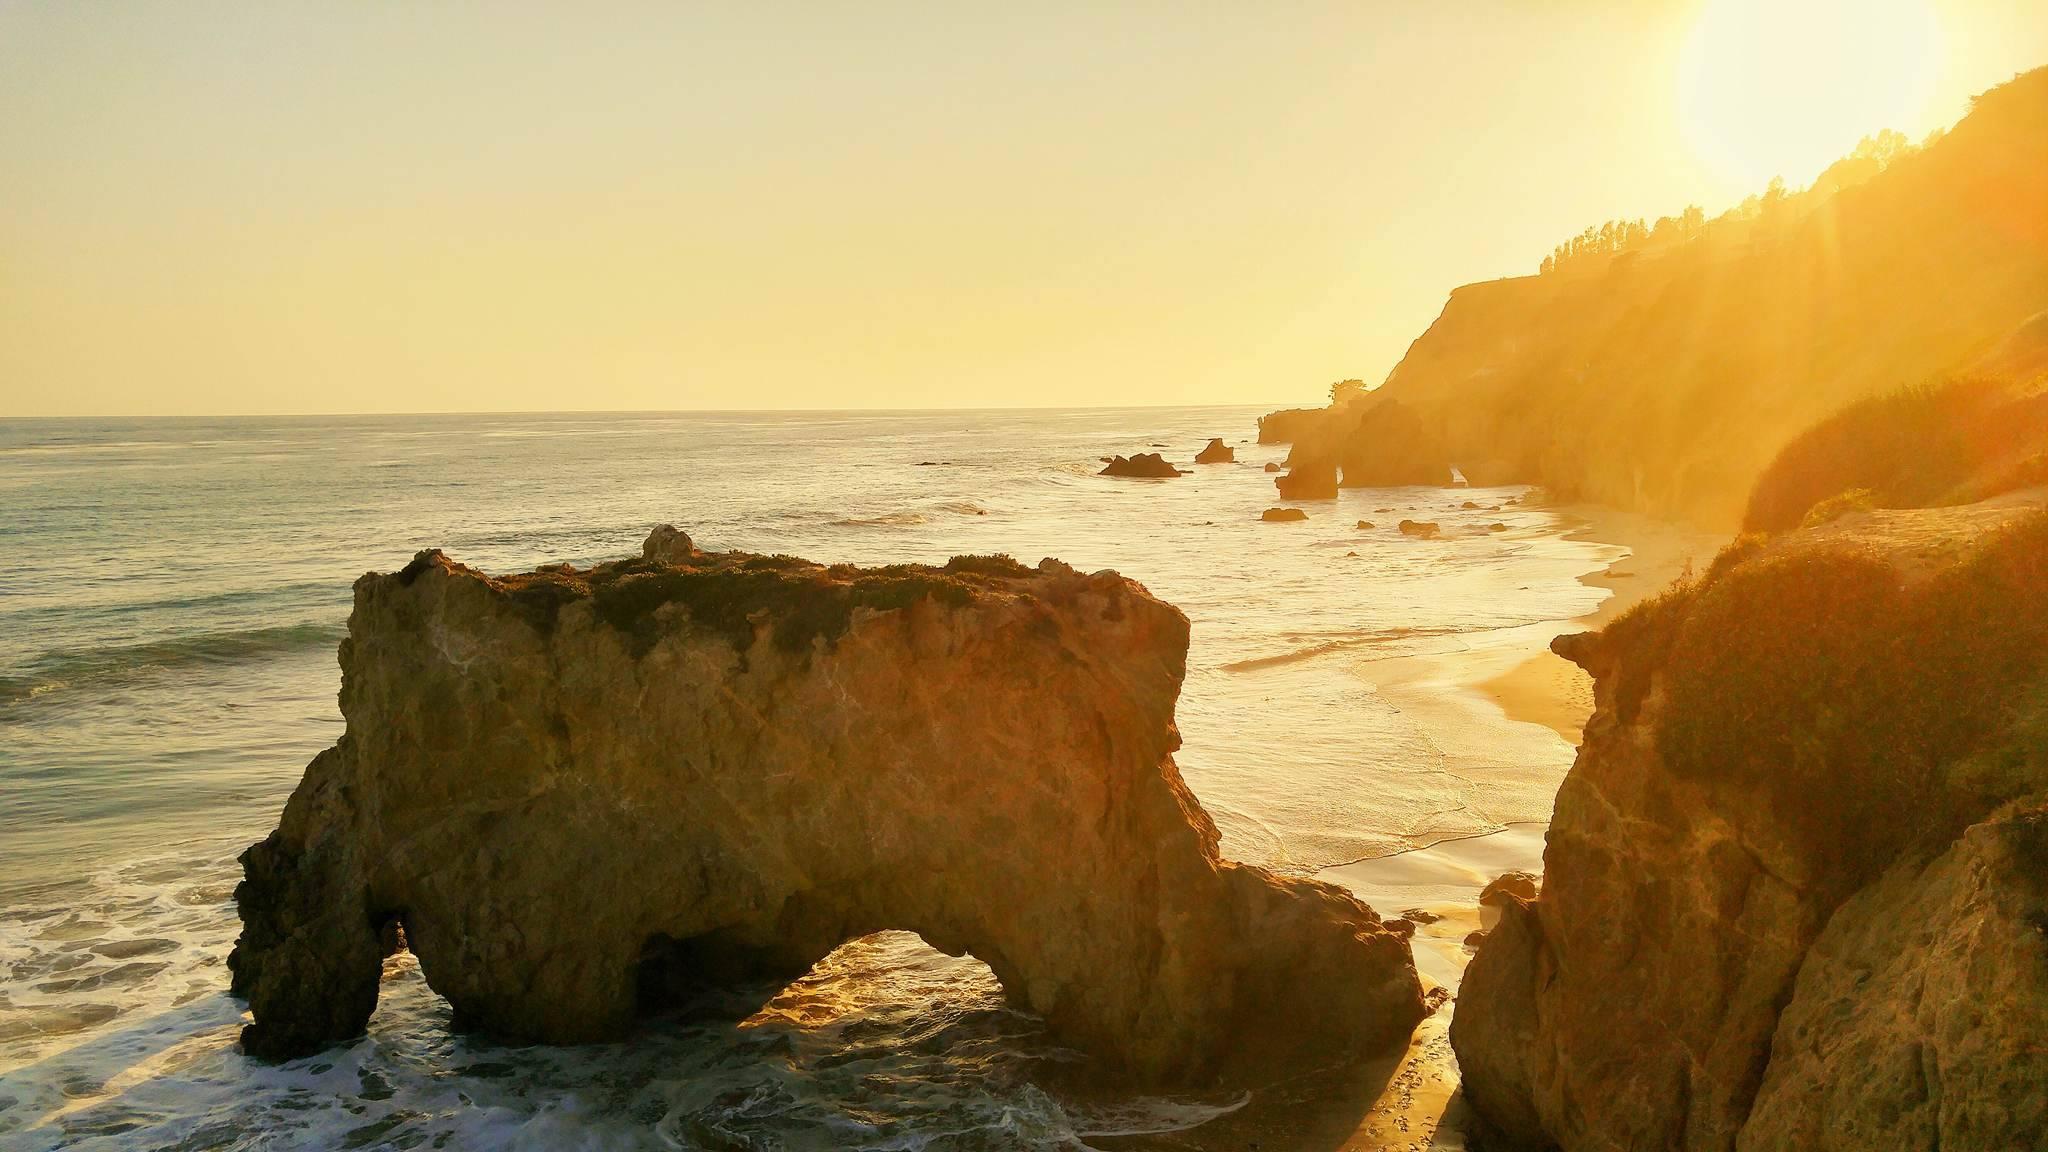 El Matador beach, Californien, Westcoast Roadtrip